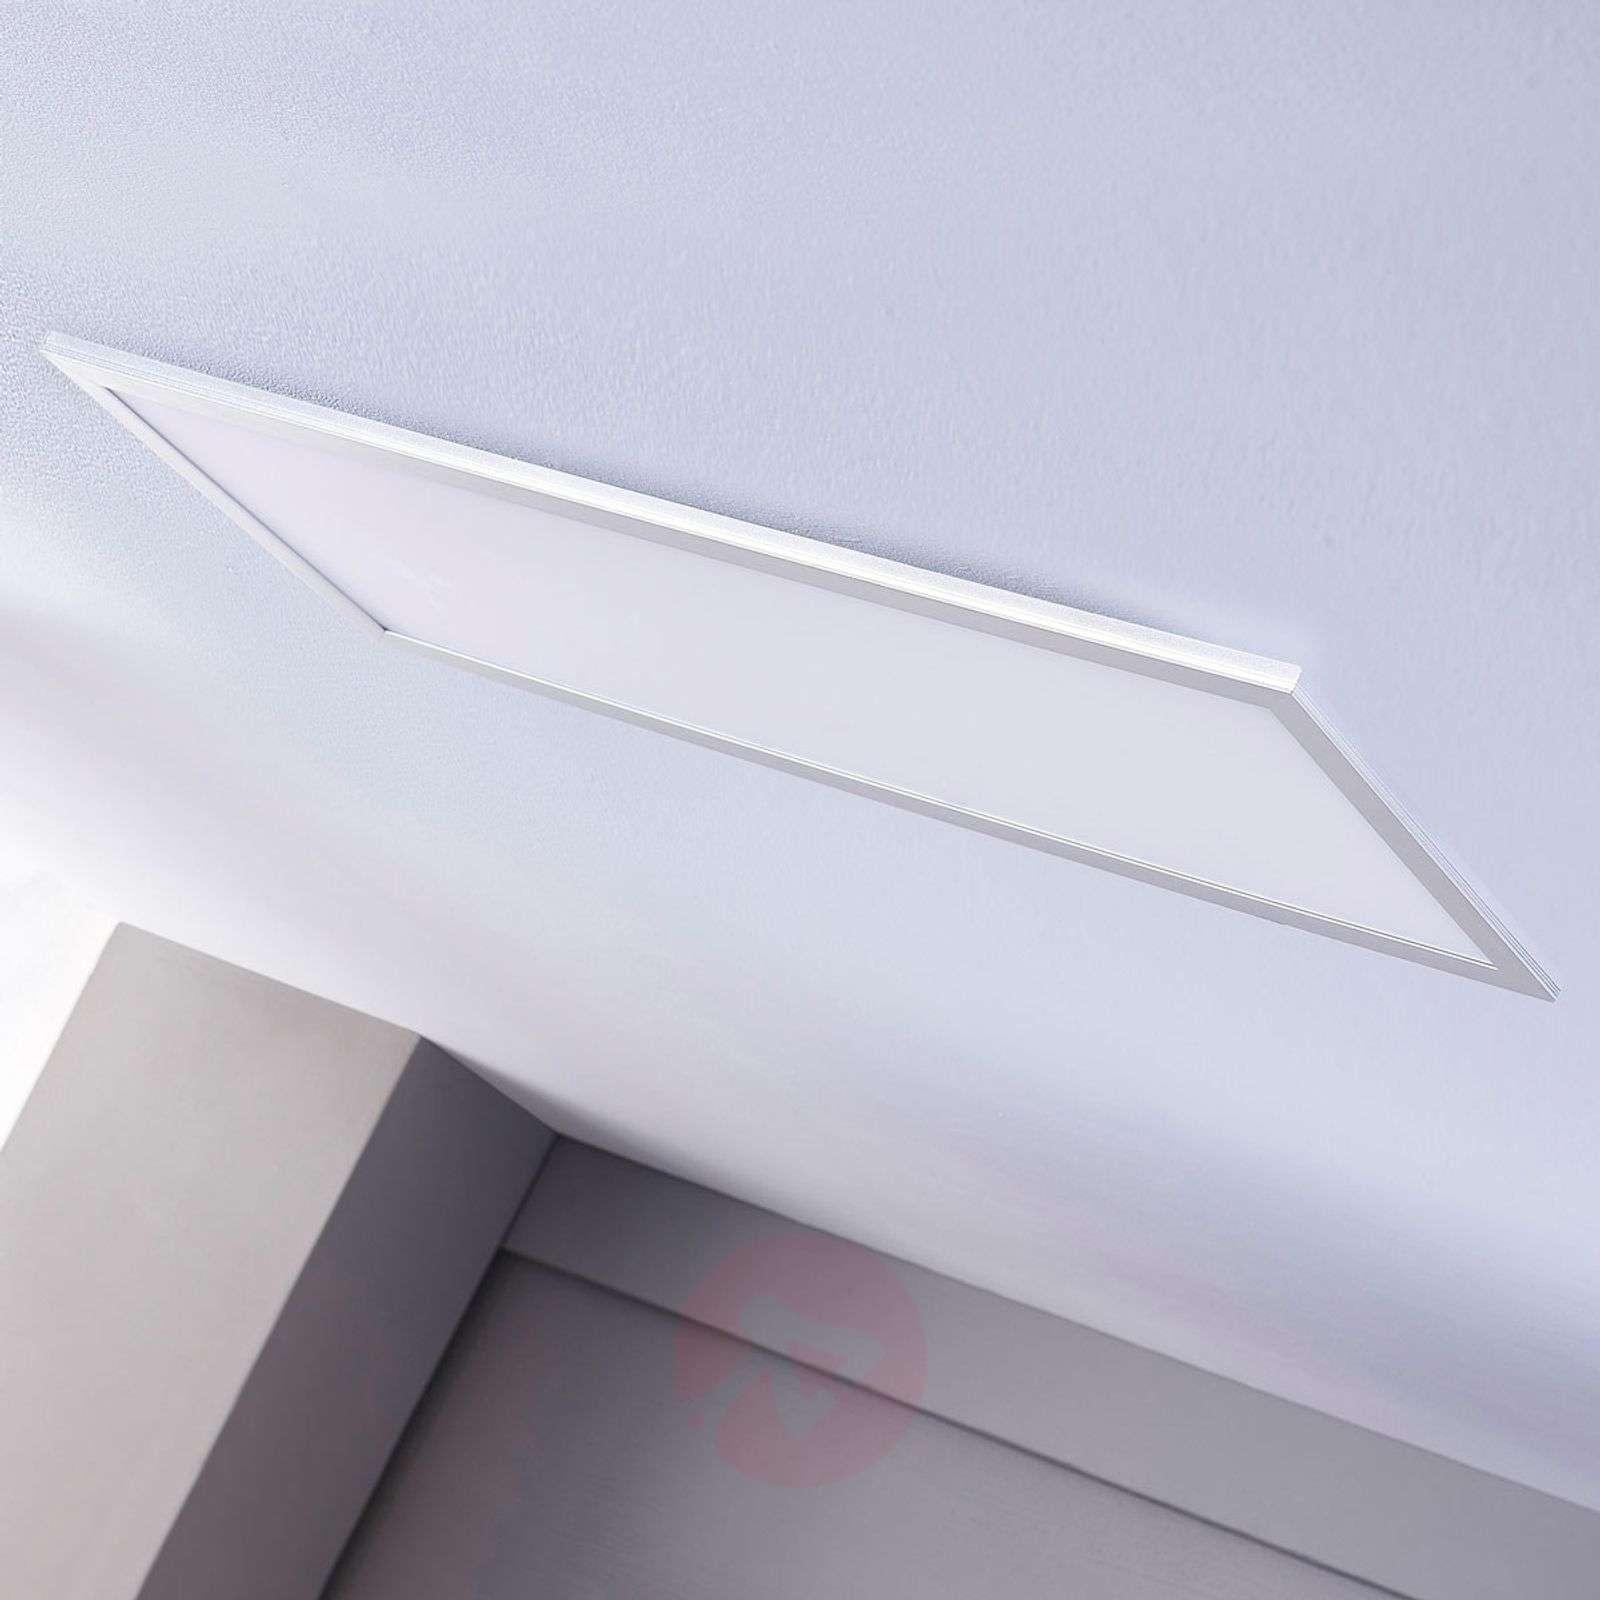 Vaihdettava valon väri – LED-kattovalaisin Liv-9956006-02